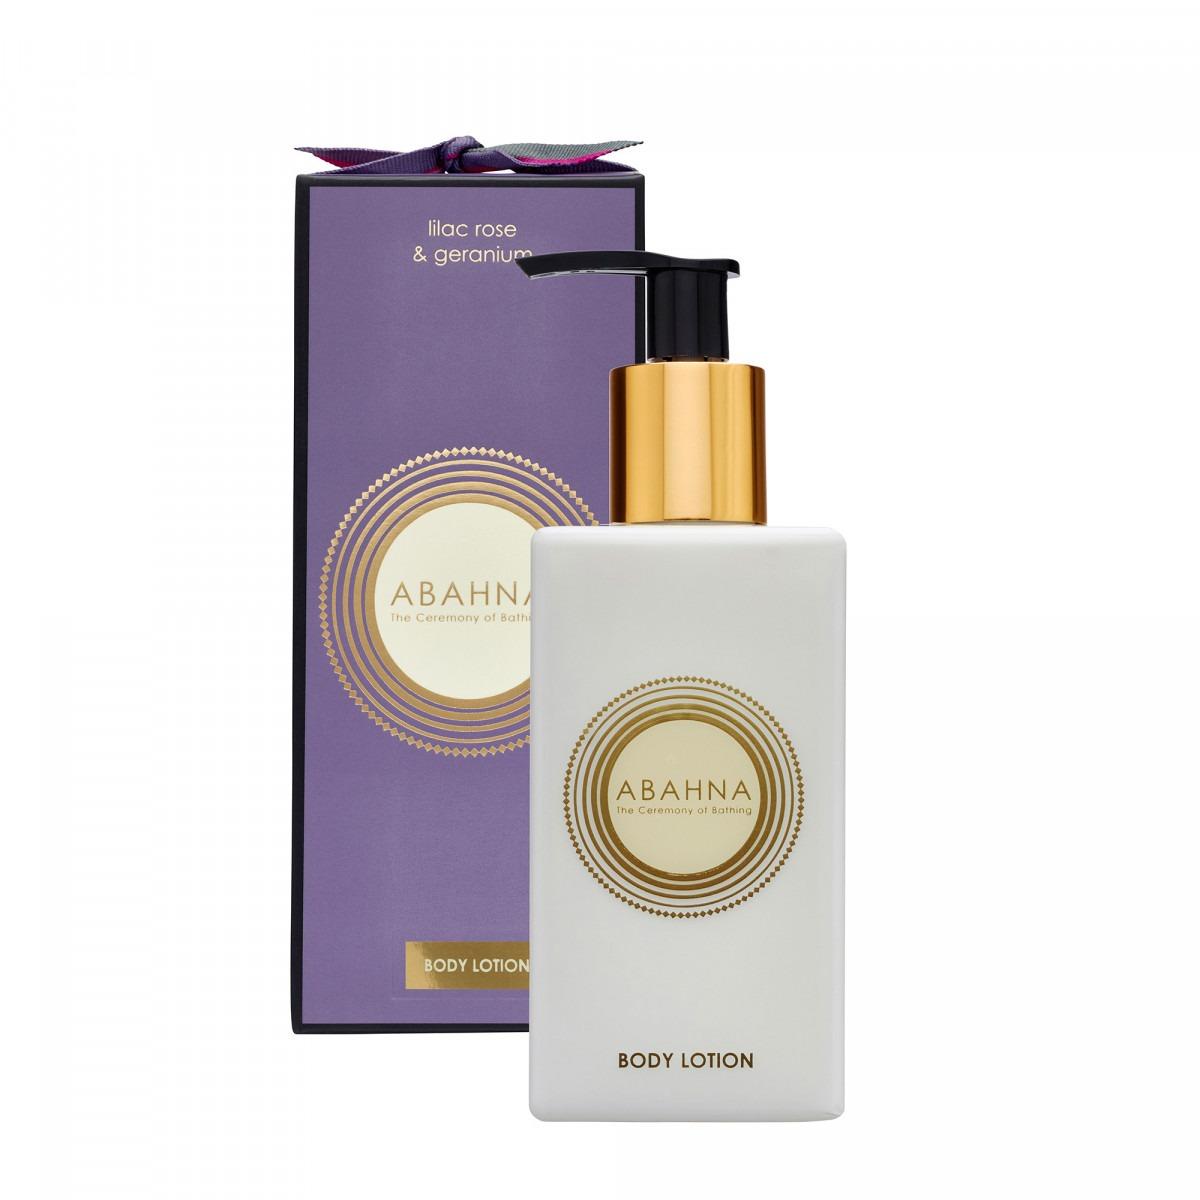 Abahna lilac rose & geranium body lotion 250ml